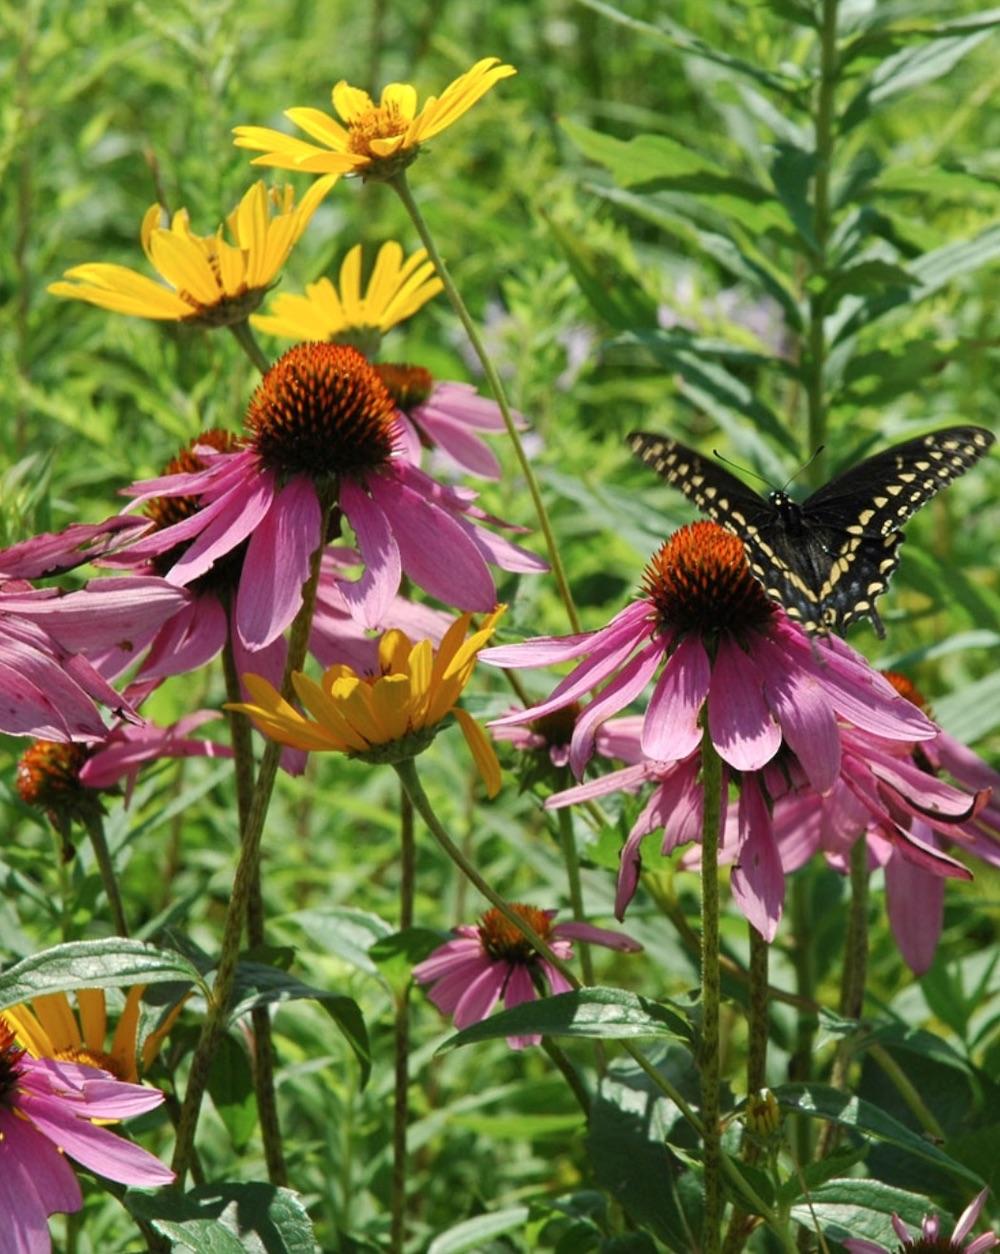 Native Plants Echinacea purpurea Purple Coneflower with Black Swallowtail #MonarchButterflies #Butterflies #SavetheMonarchs #Gardening #Plants #GardenPollinators #AttractMonarchButterflies #NectarRichPlants #BeneficialForPollinators